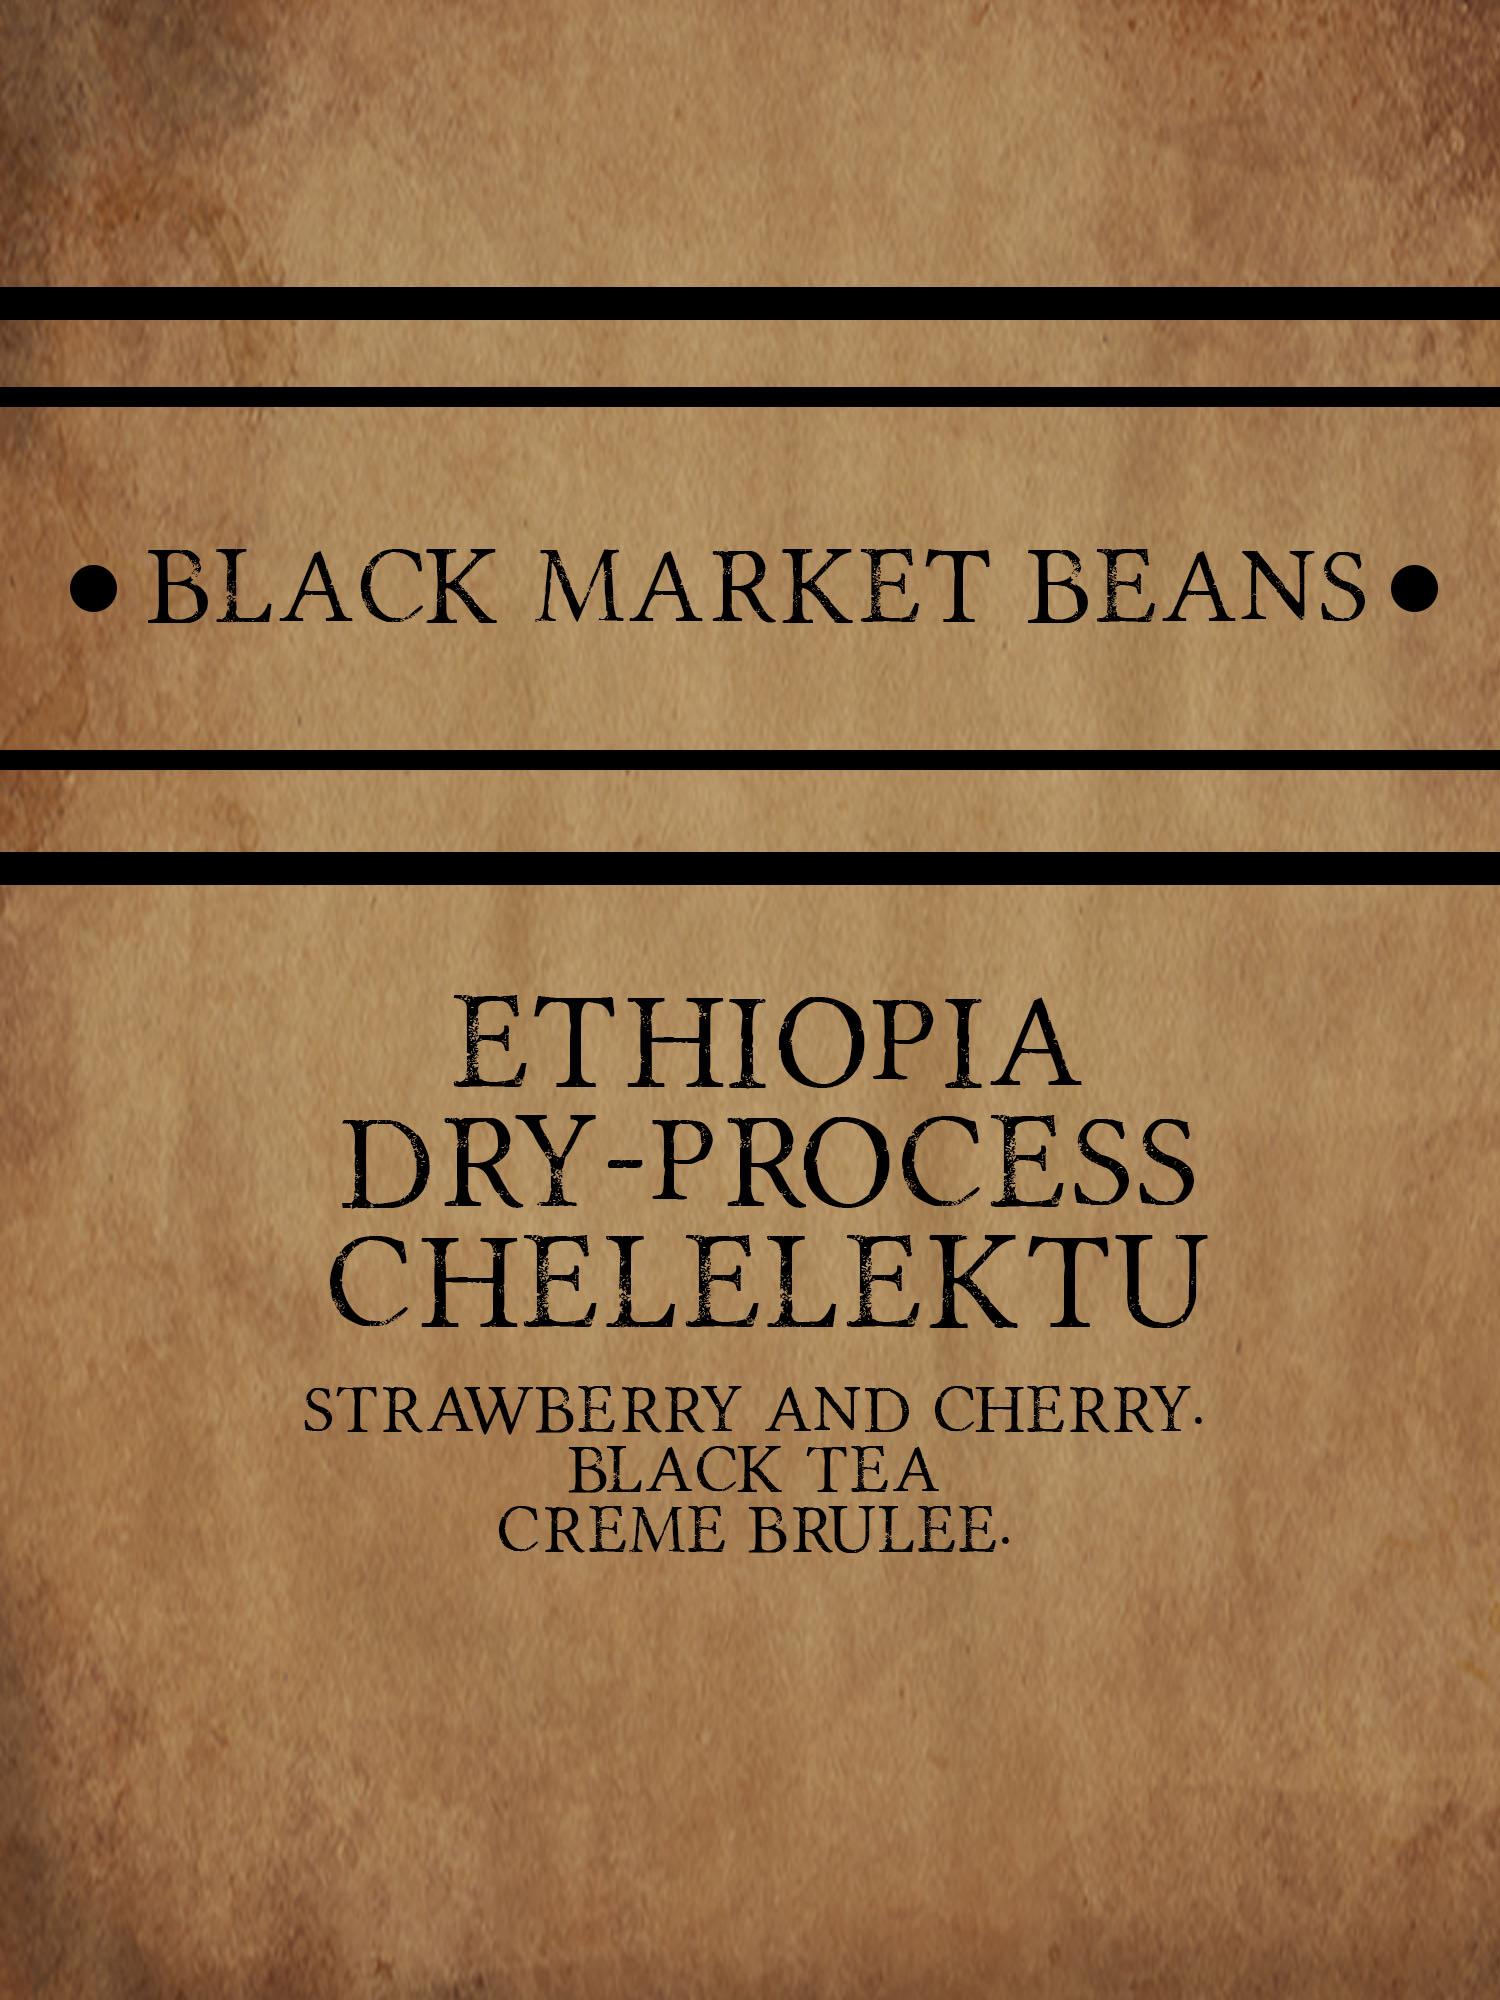 coffee_Ethiopia_Chelelektu_dry_process.jpg